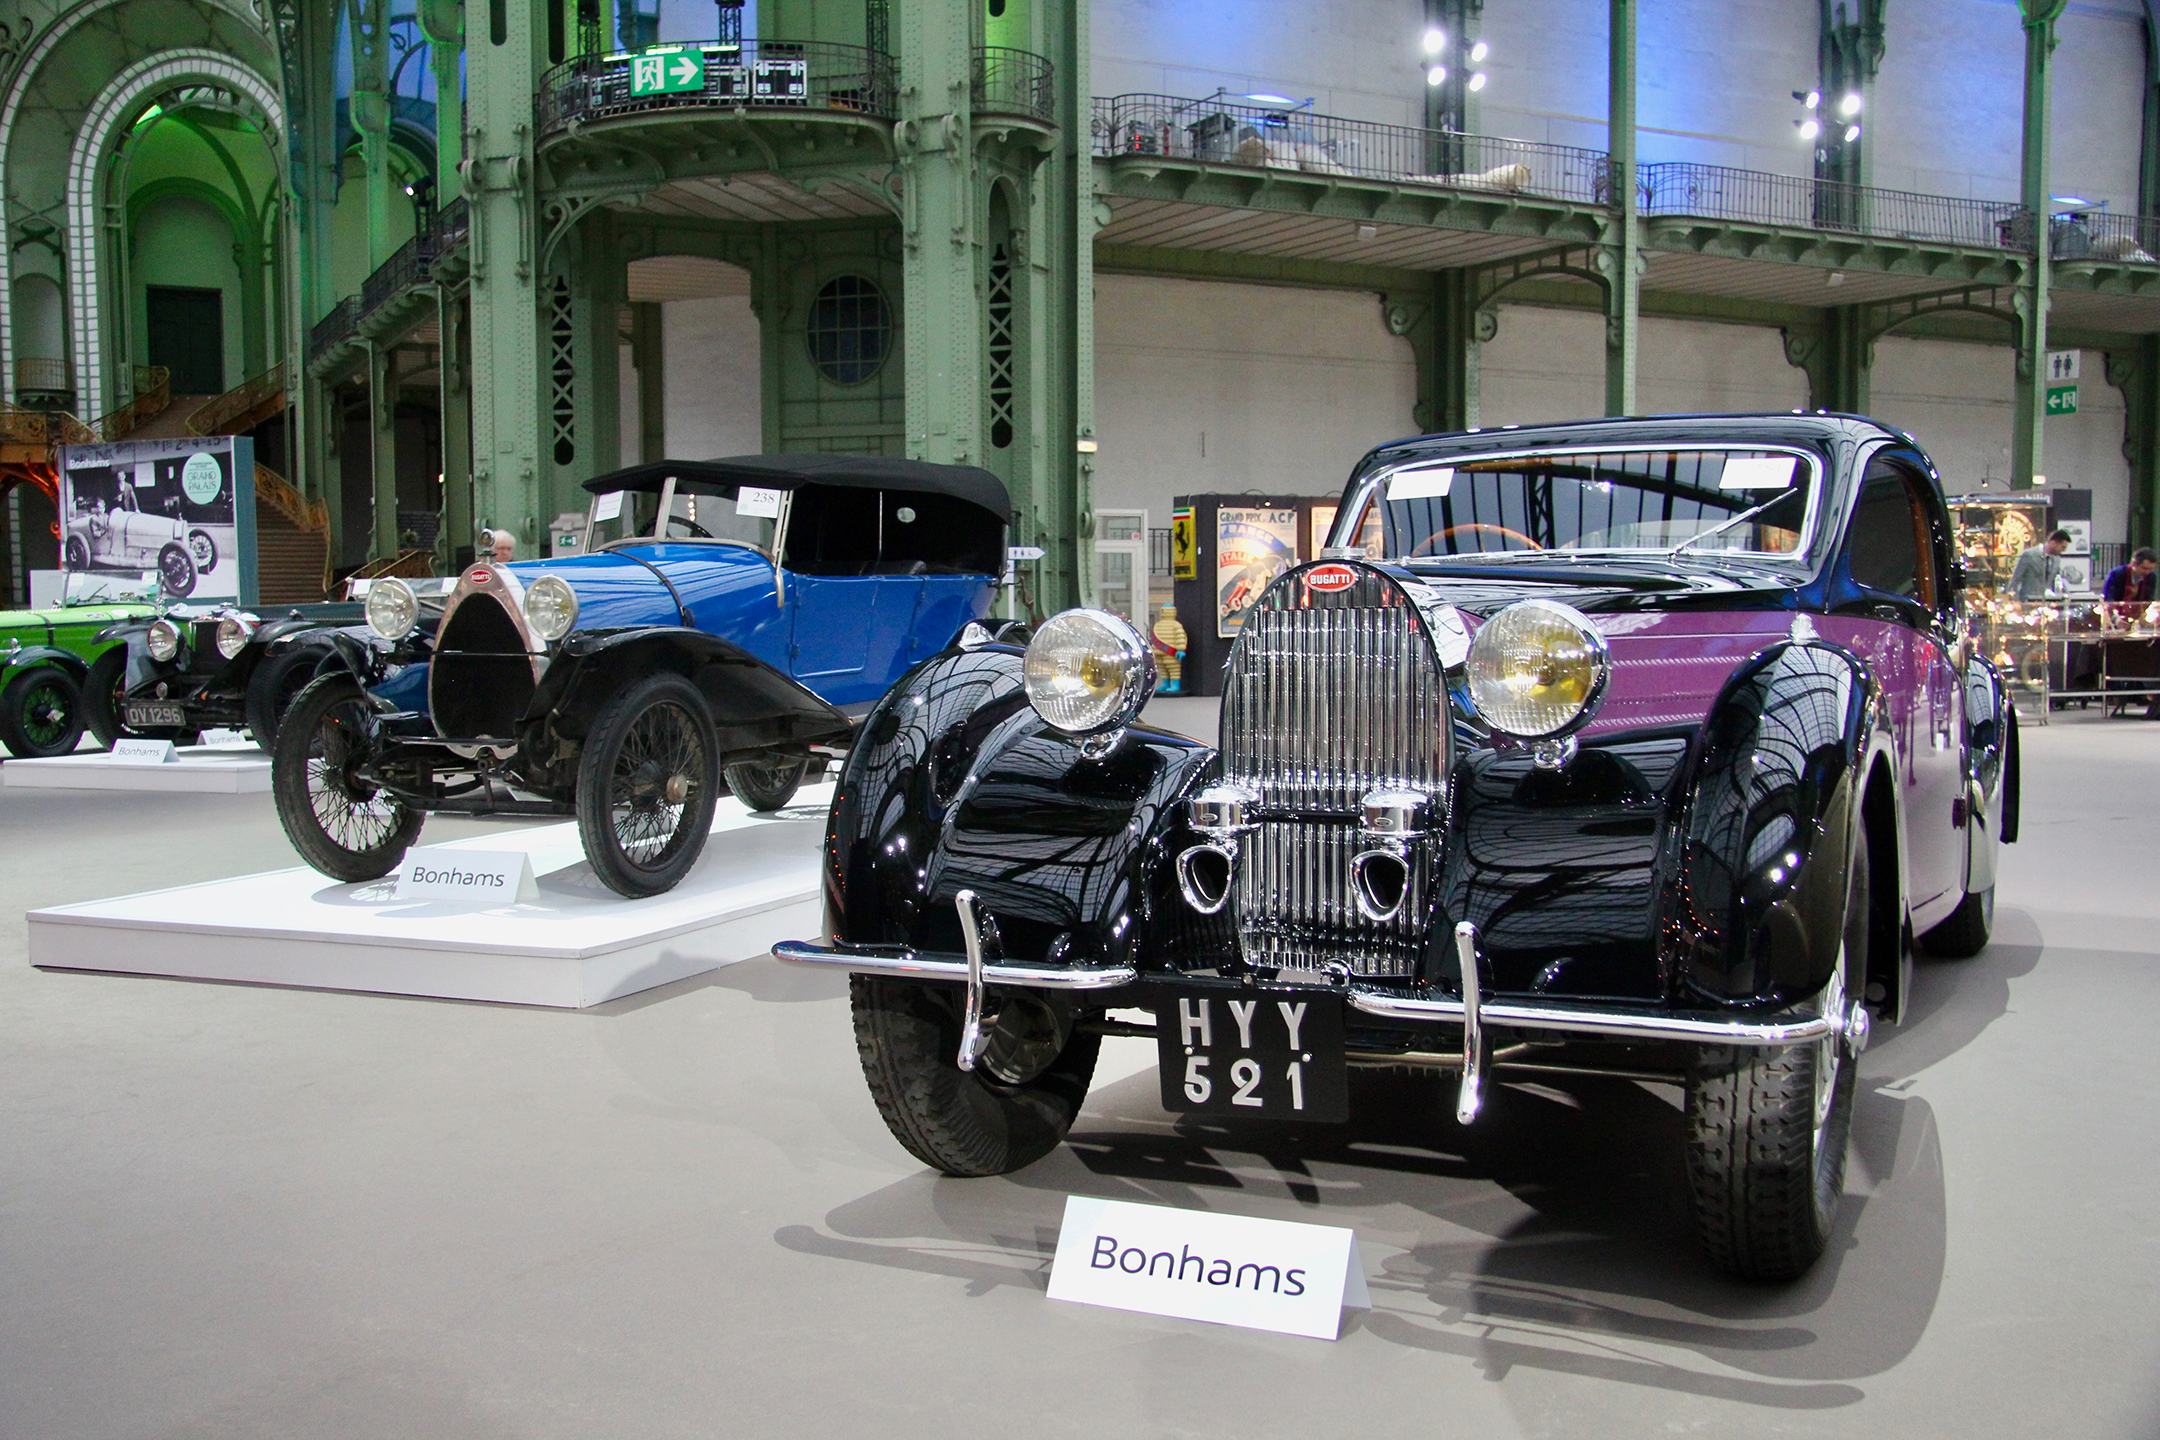 Bugatti Type 57 Atalante Coupé - 1938 - Les Grandes Marques du Monde au Grand Palais - Bonhams - 2020 - photo Ludo Ferrari